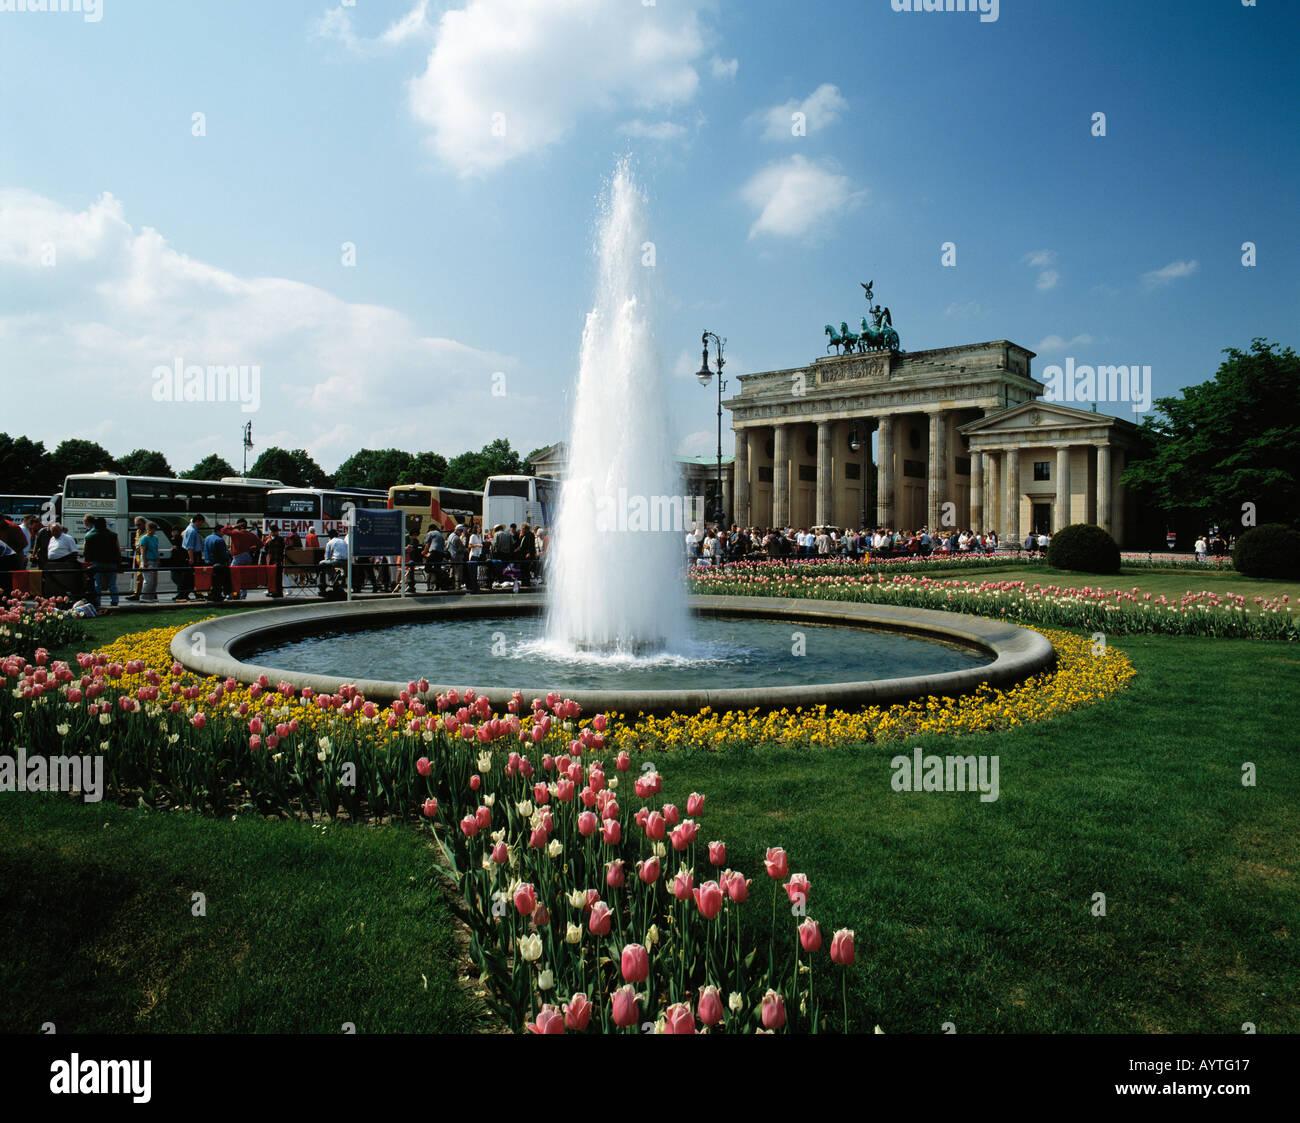 Pariser Platz Mit Brandenburger Tor Springbrunnen Tulpenfeld Stock Photo Alamy